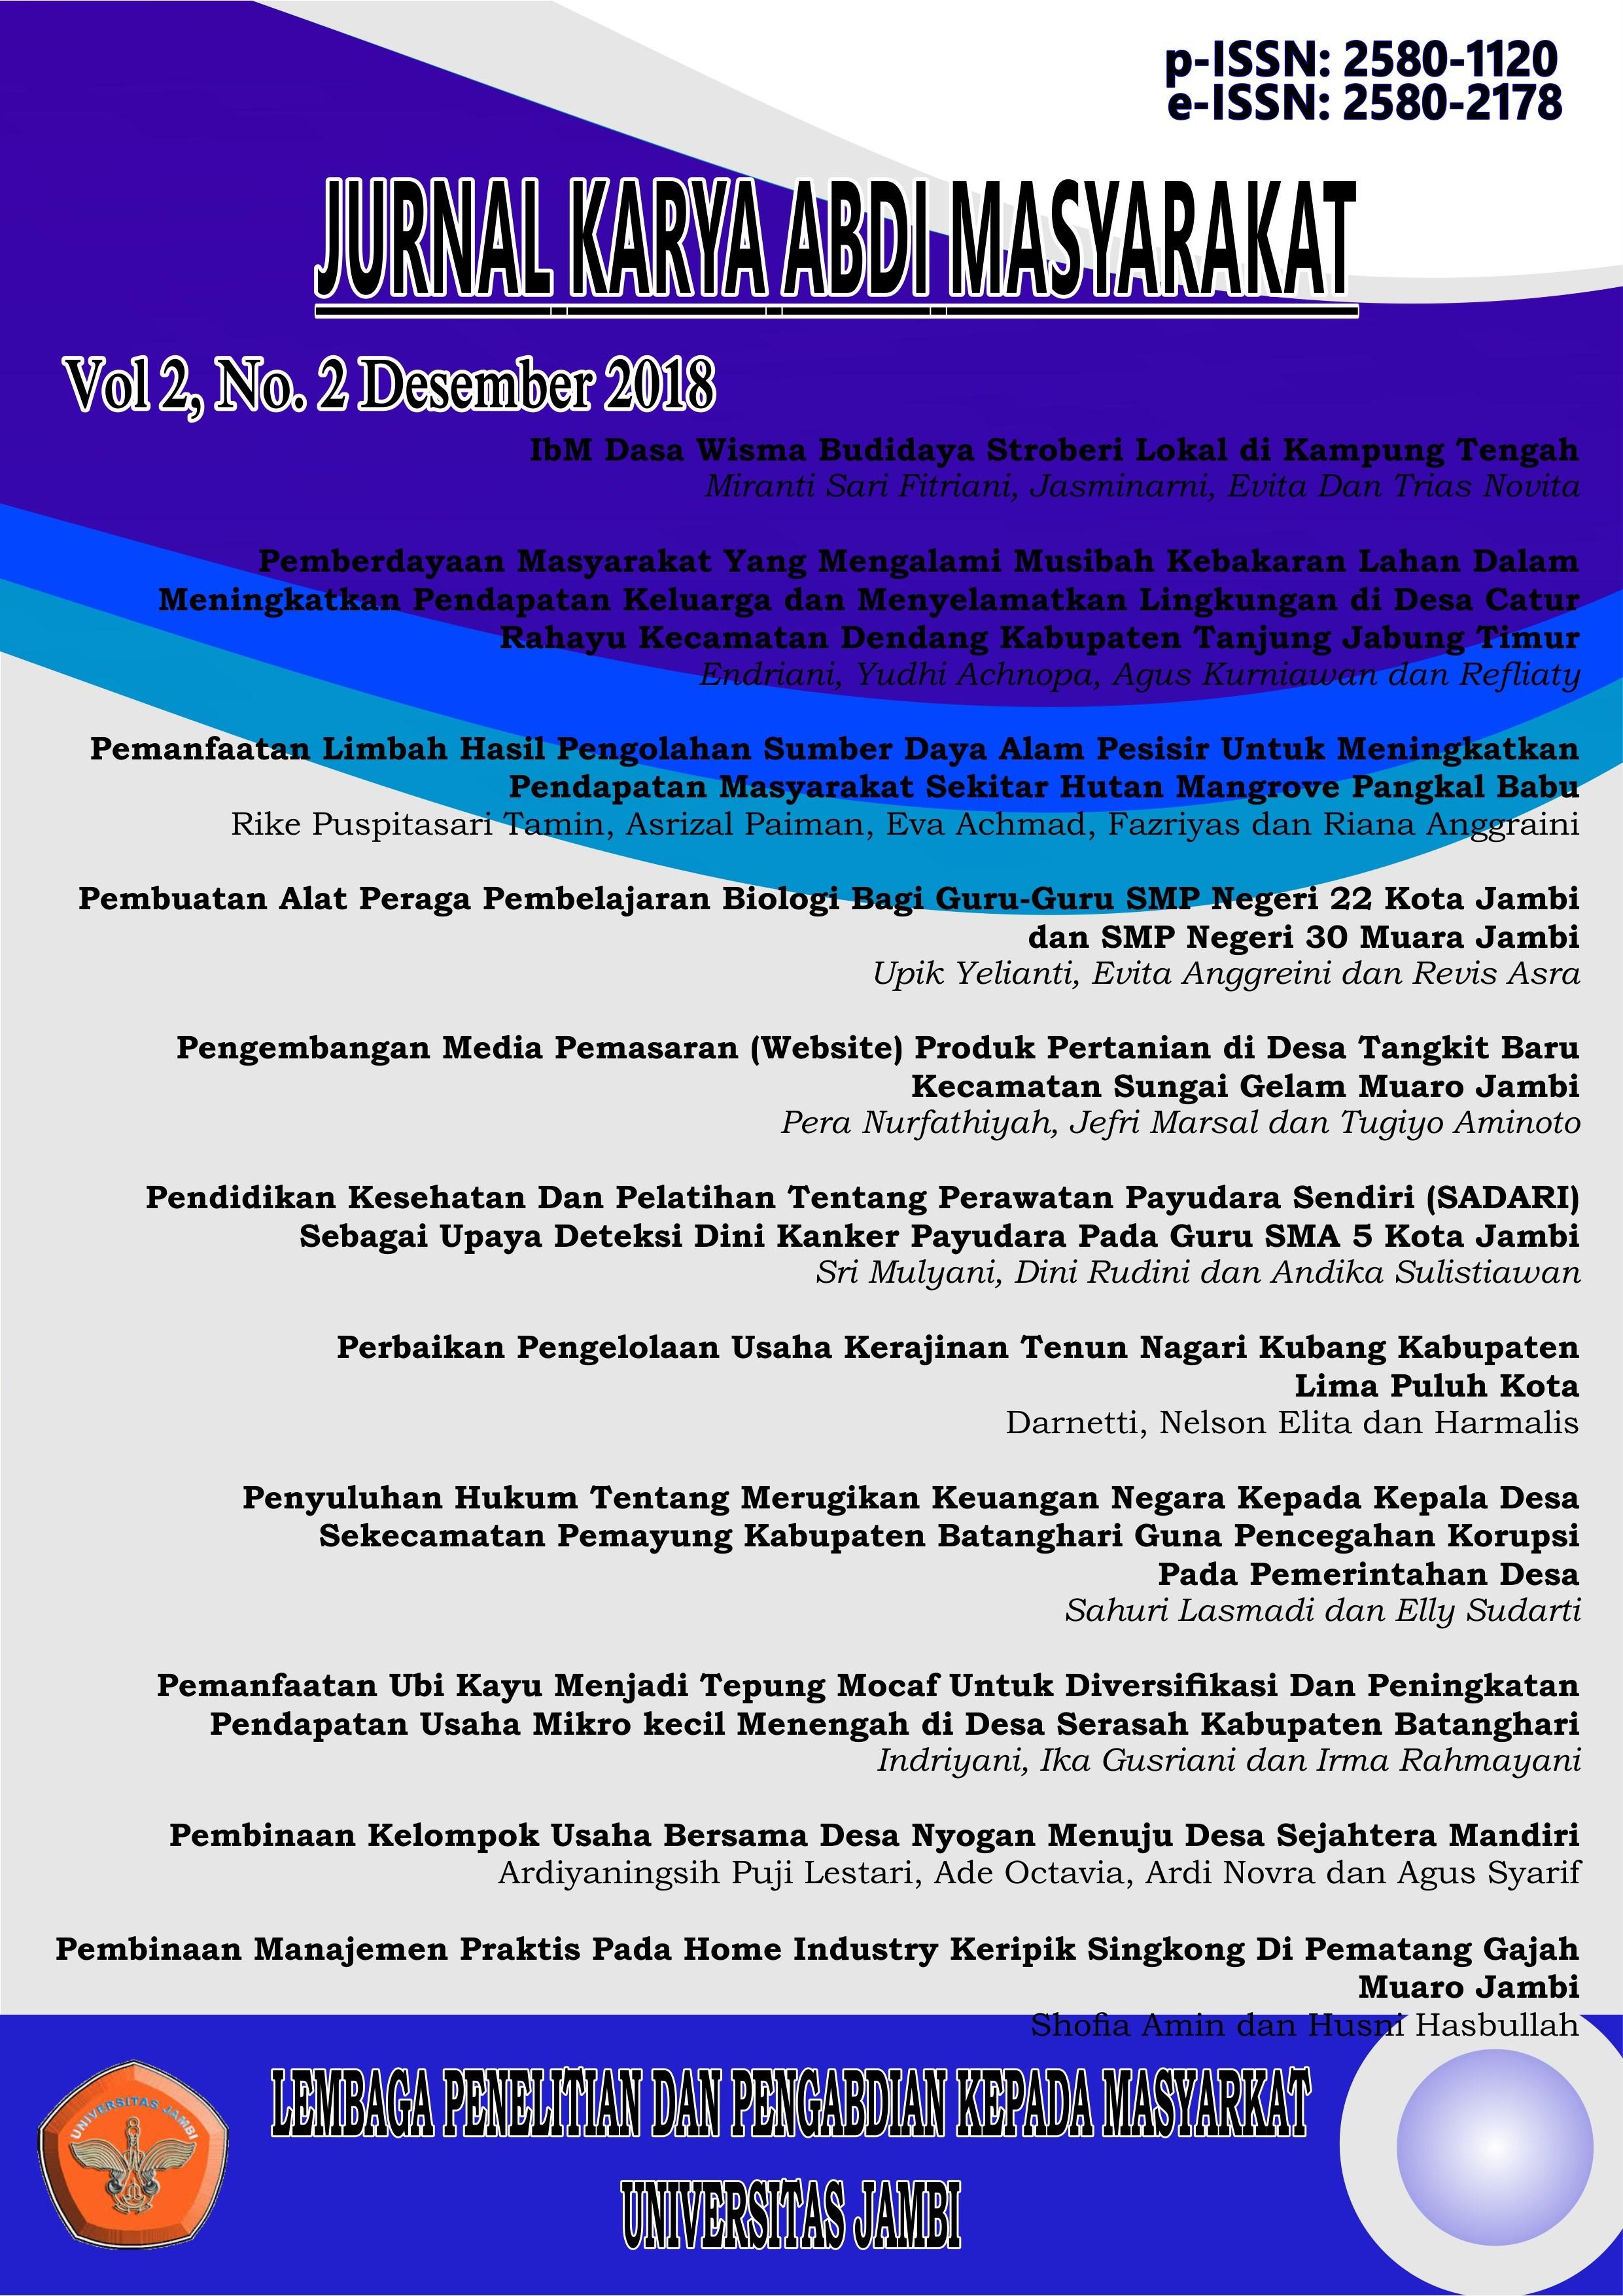 View Vol. 2 No. 2 (2018): Volume 2, No (Issue) 2, Desember 2018